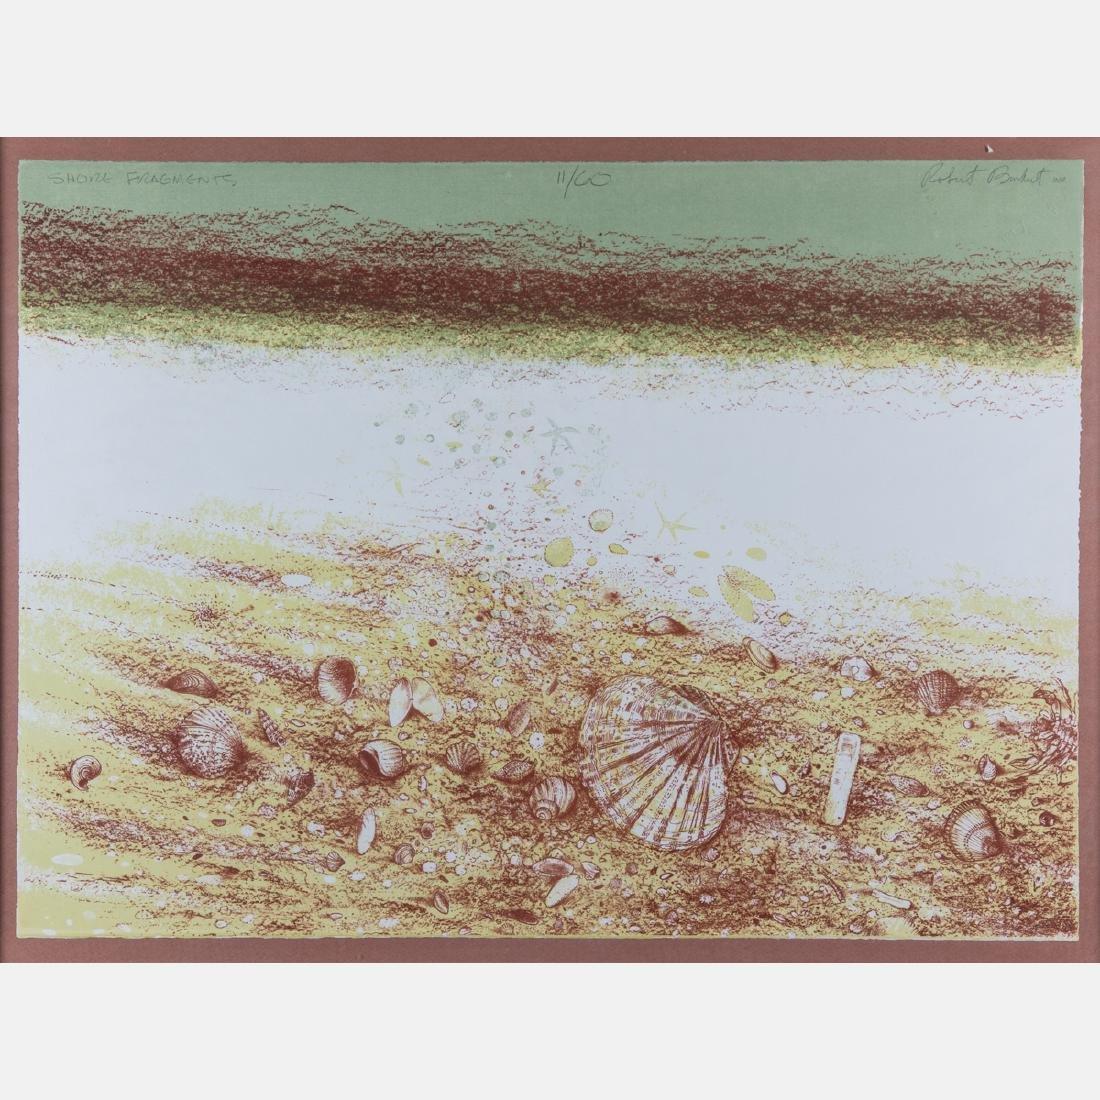 Robert Randall Burkert (b. 1930) 'Sea Edge' and 'Shore - 2